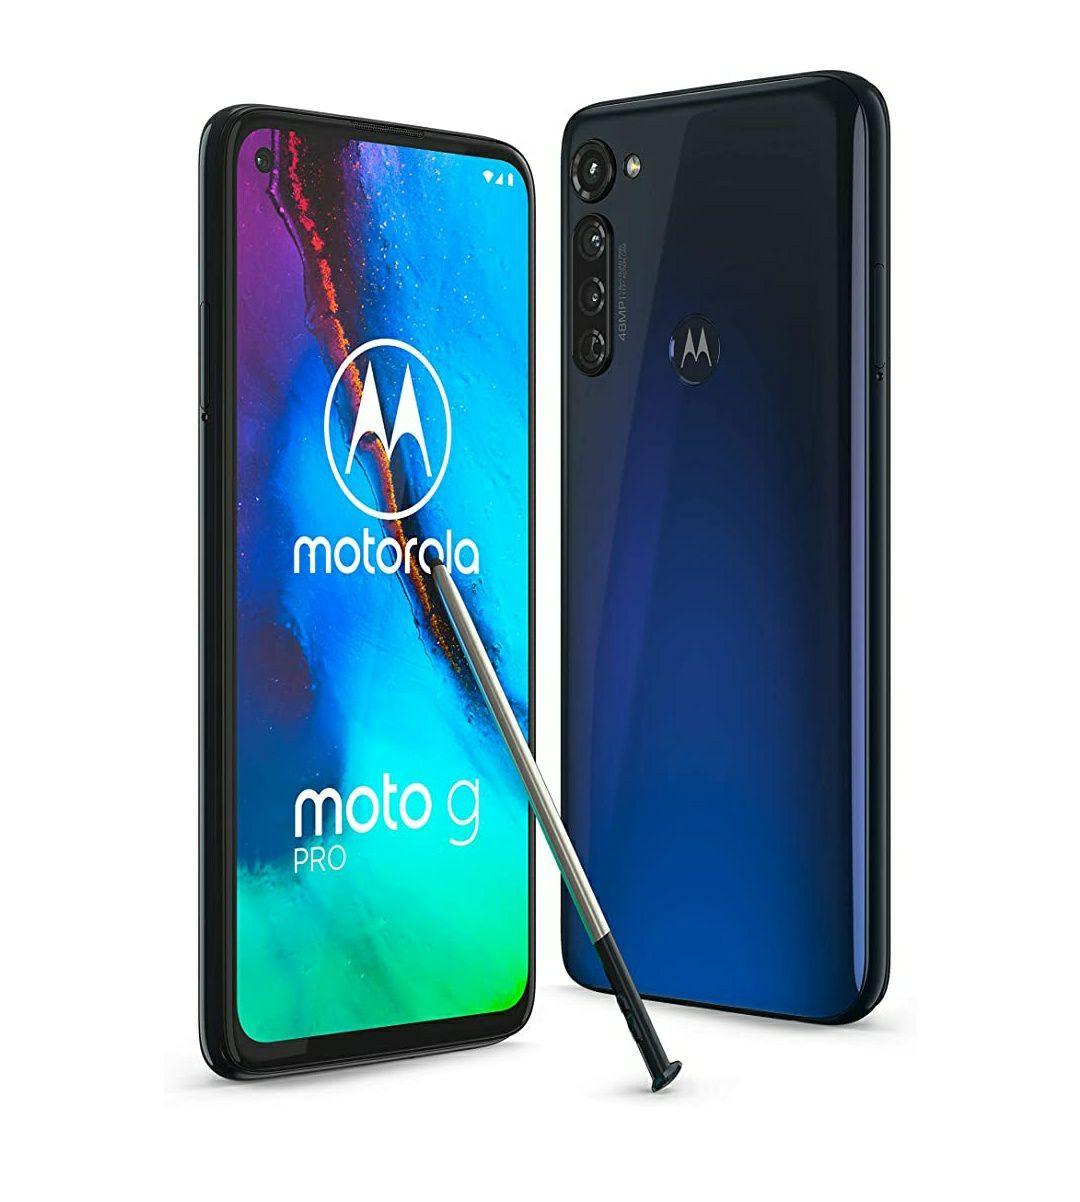 Motorola G8 Pro Indigo - 128 GB Storage - 4 GB RAM Smartphone NFC 4000mAh Stylus - £289.99 @ Amazon